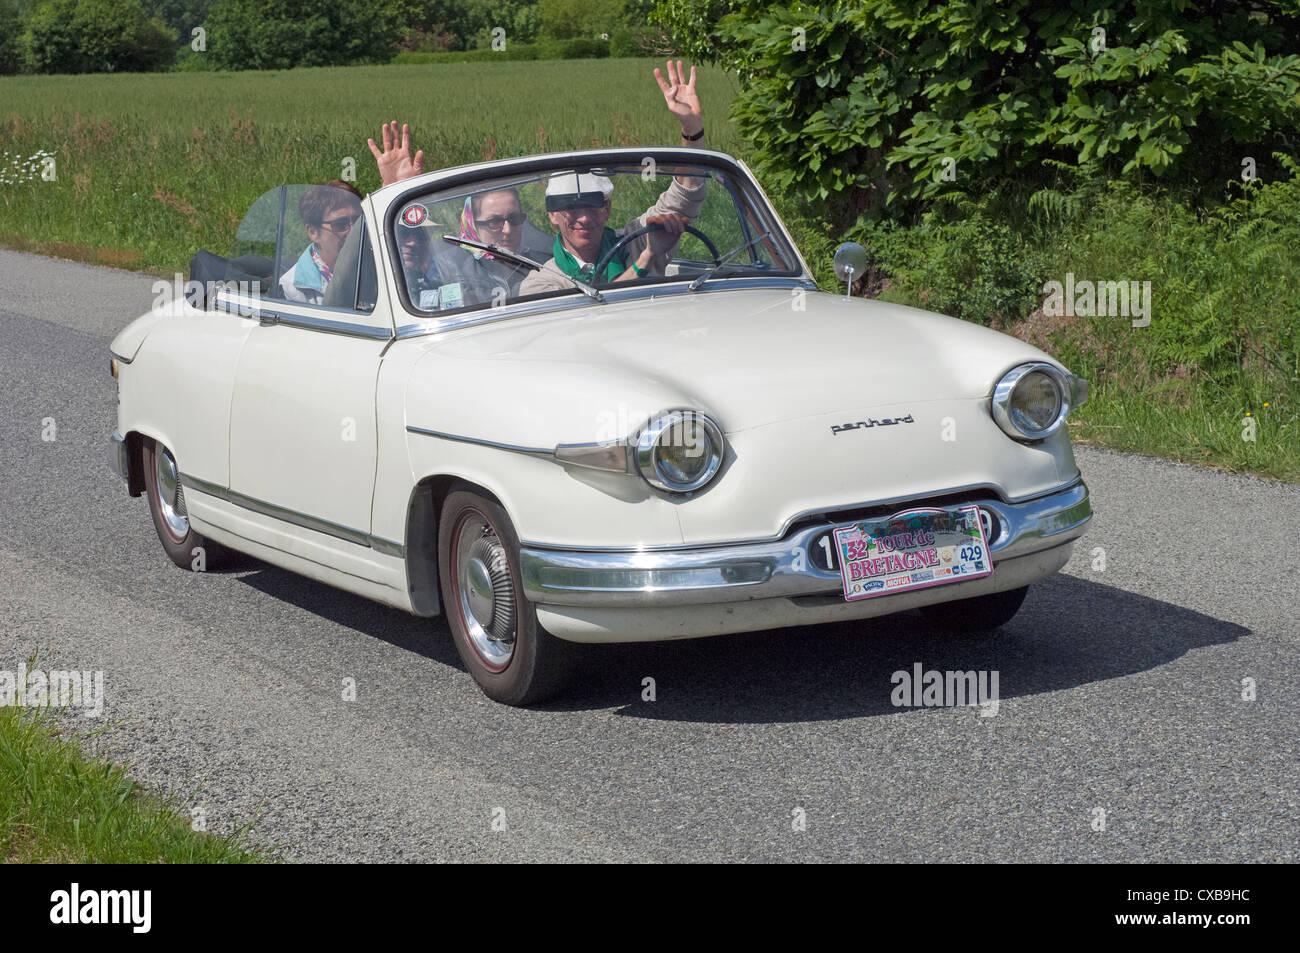 Panhard PL 17 Cabriolet of 1963 in the Tour de Bretagne, France, 2012 - Stock Image